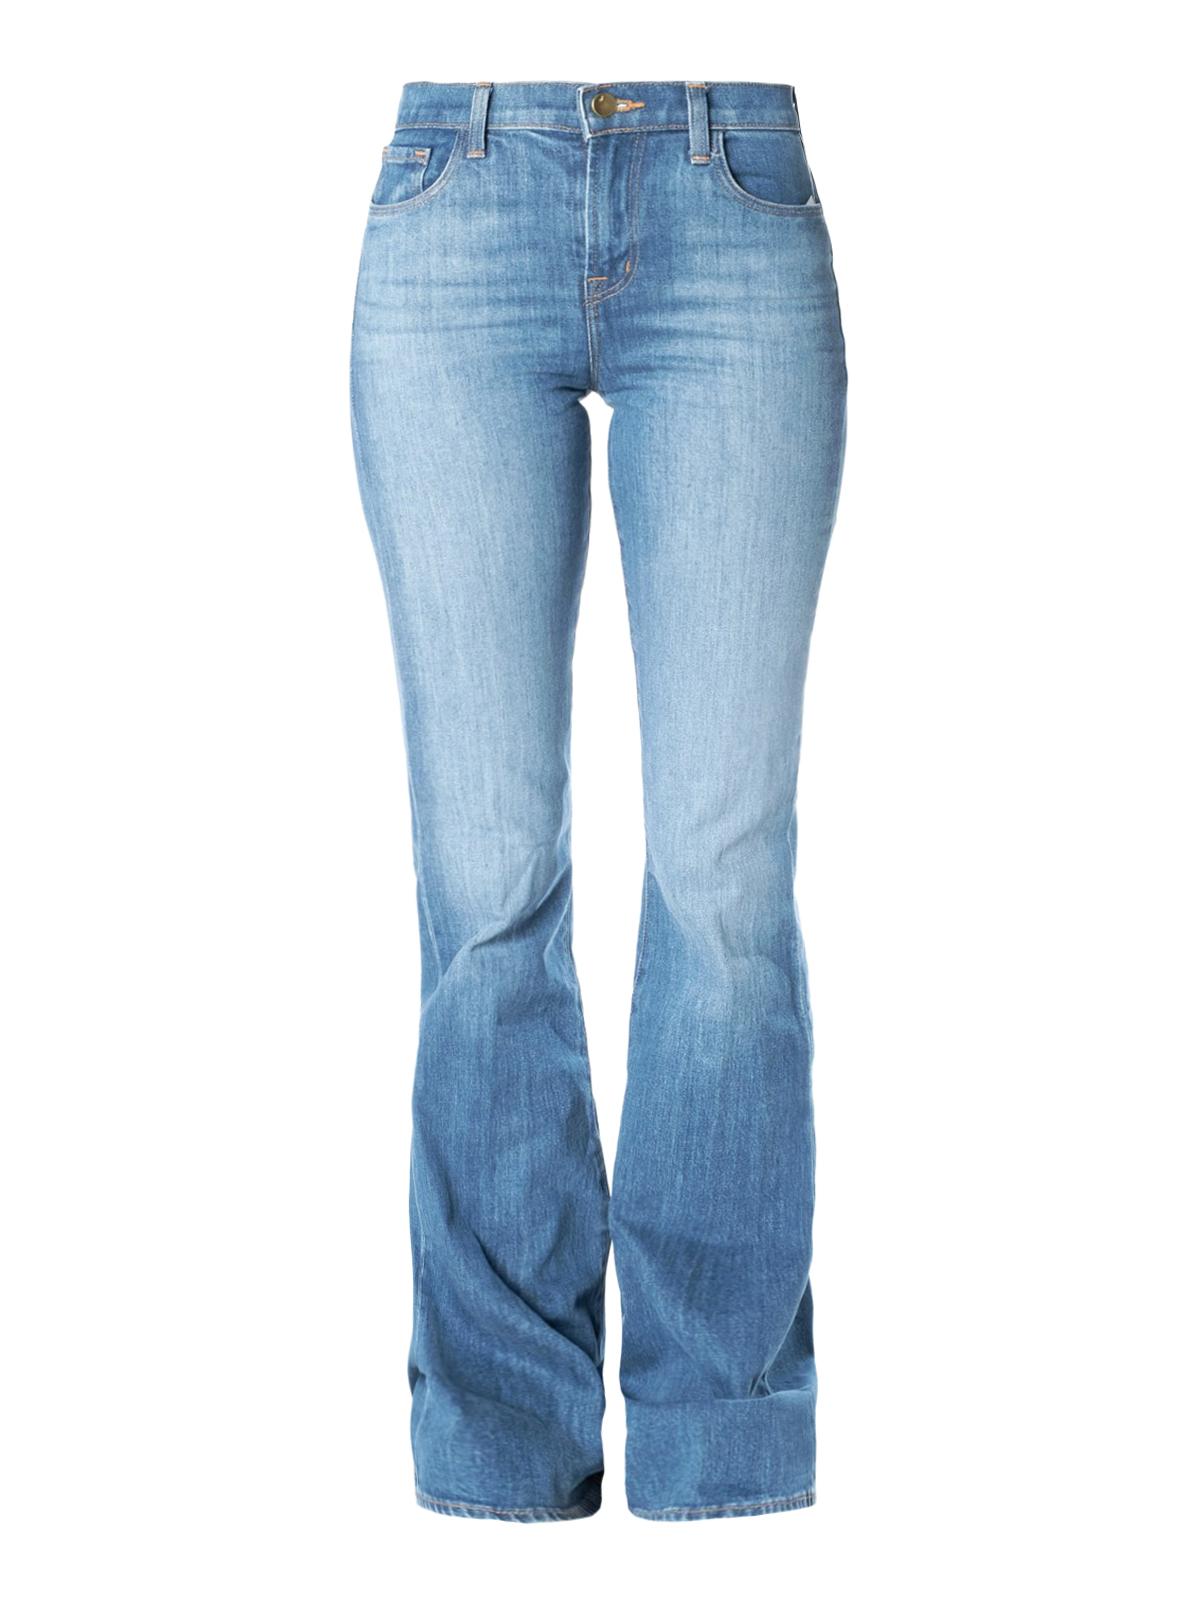 J Brand Faded Denim Bootcut Jeans In Medium Wash